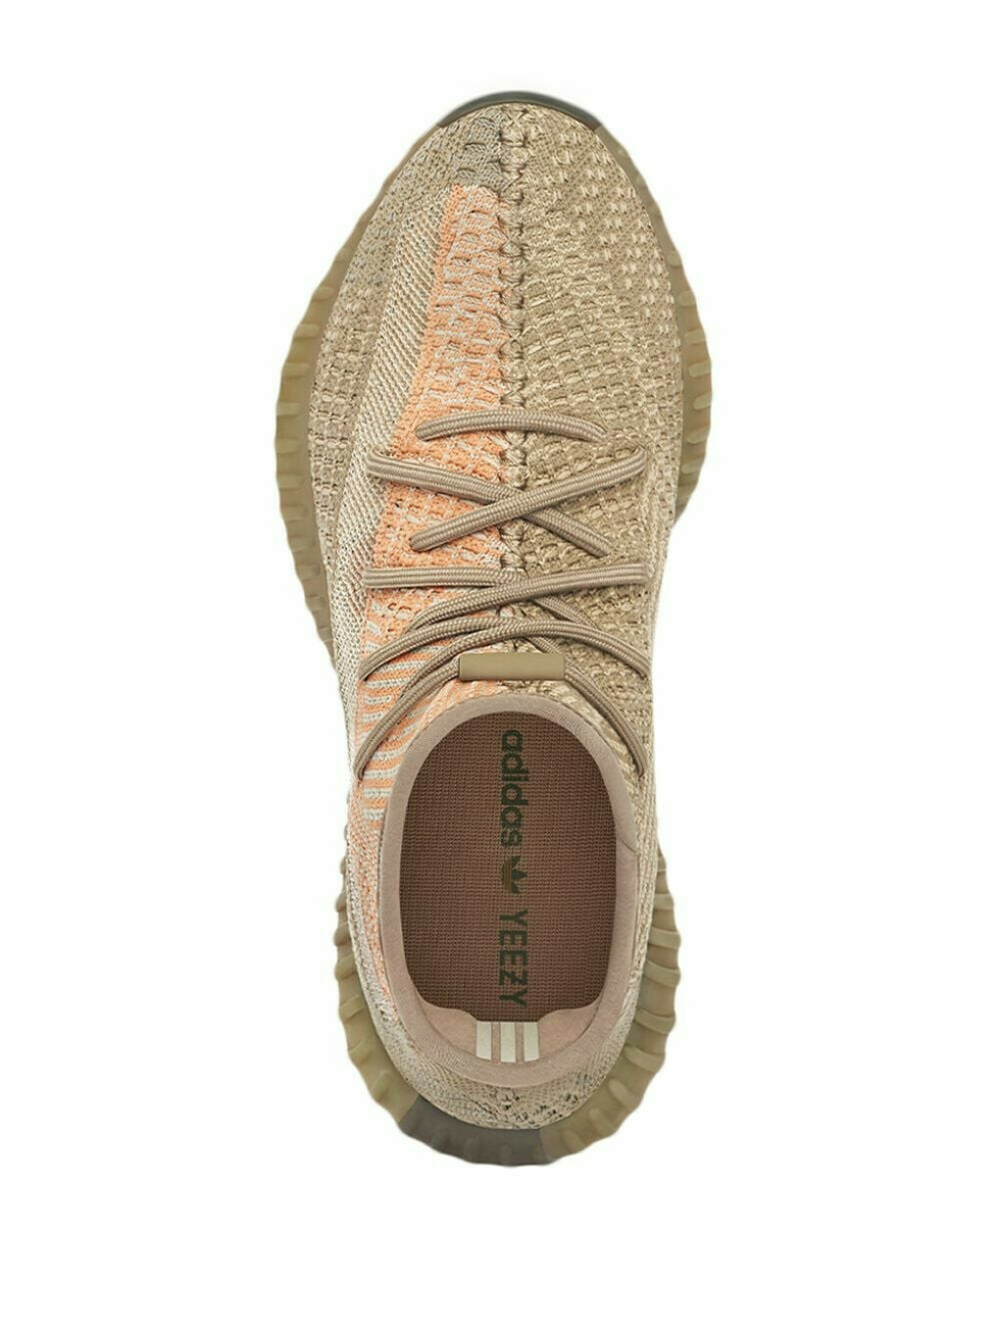 adidas YEEZY кроссовки Yeezy Boost 350 V2 'Sand Taupe'